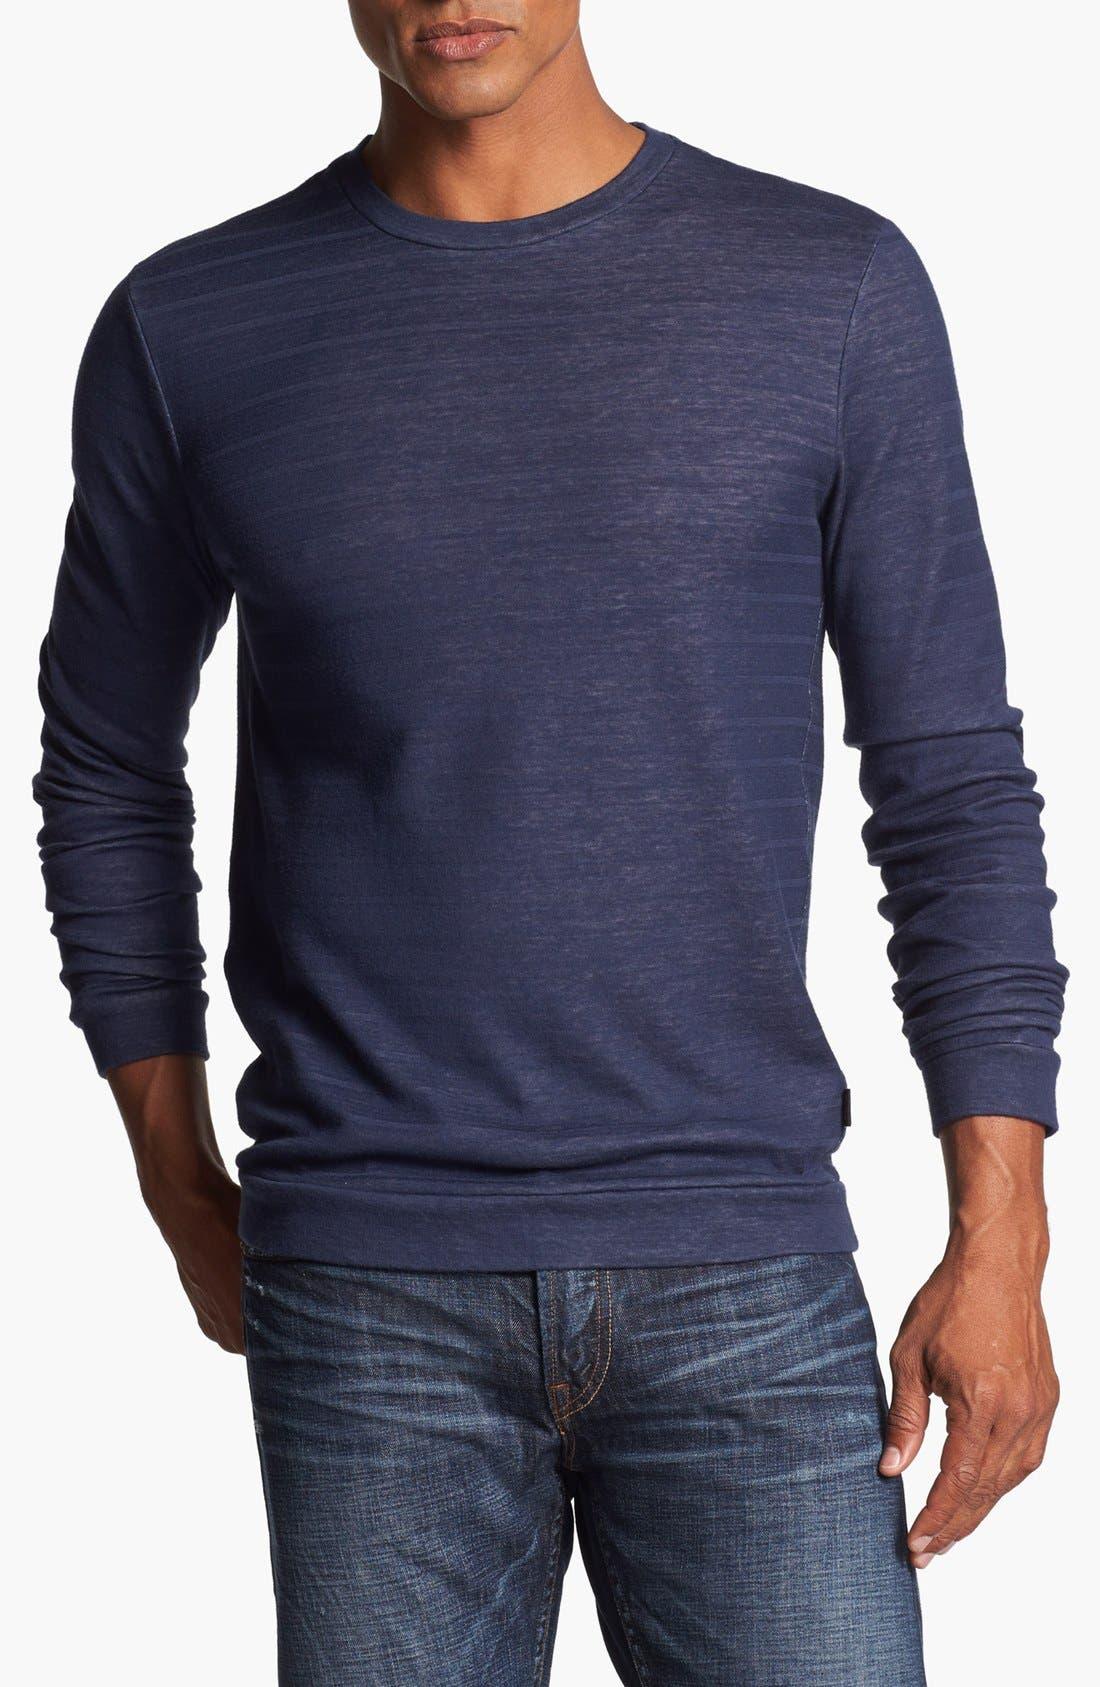 Alternate Image 1 Selected - BOSS Black 'Abruzzi' Sweater